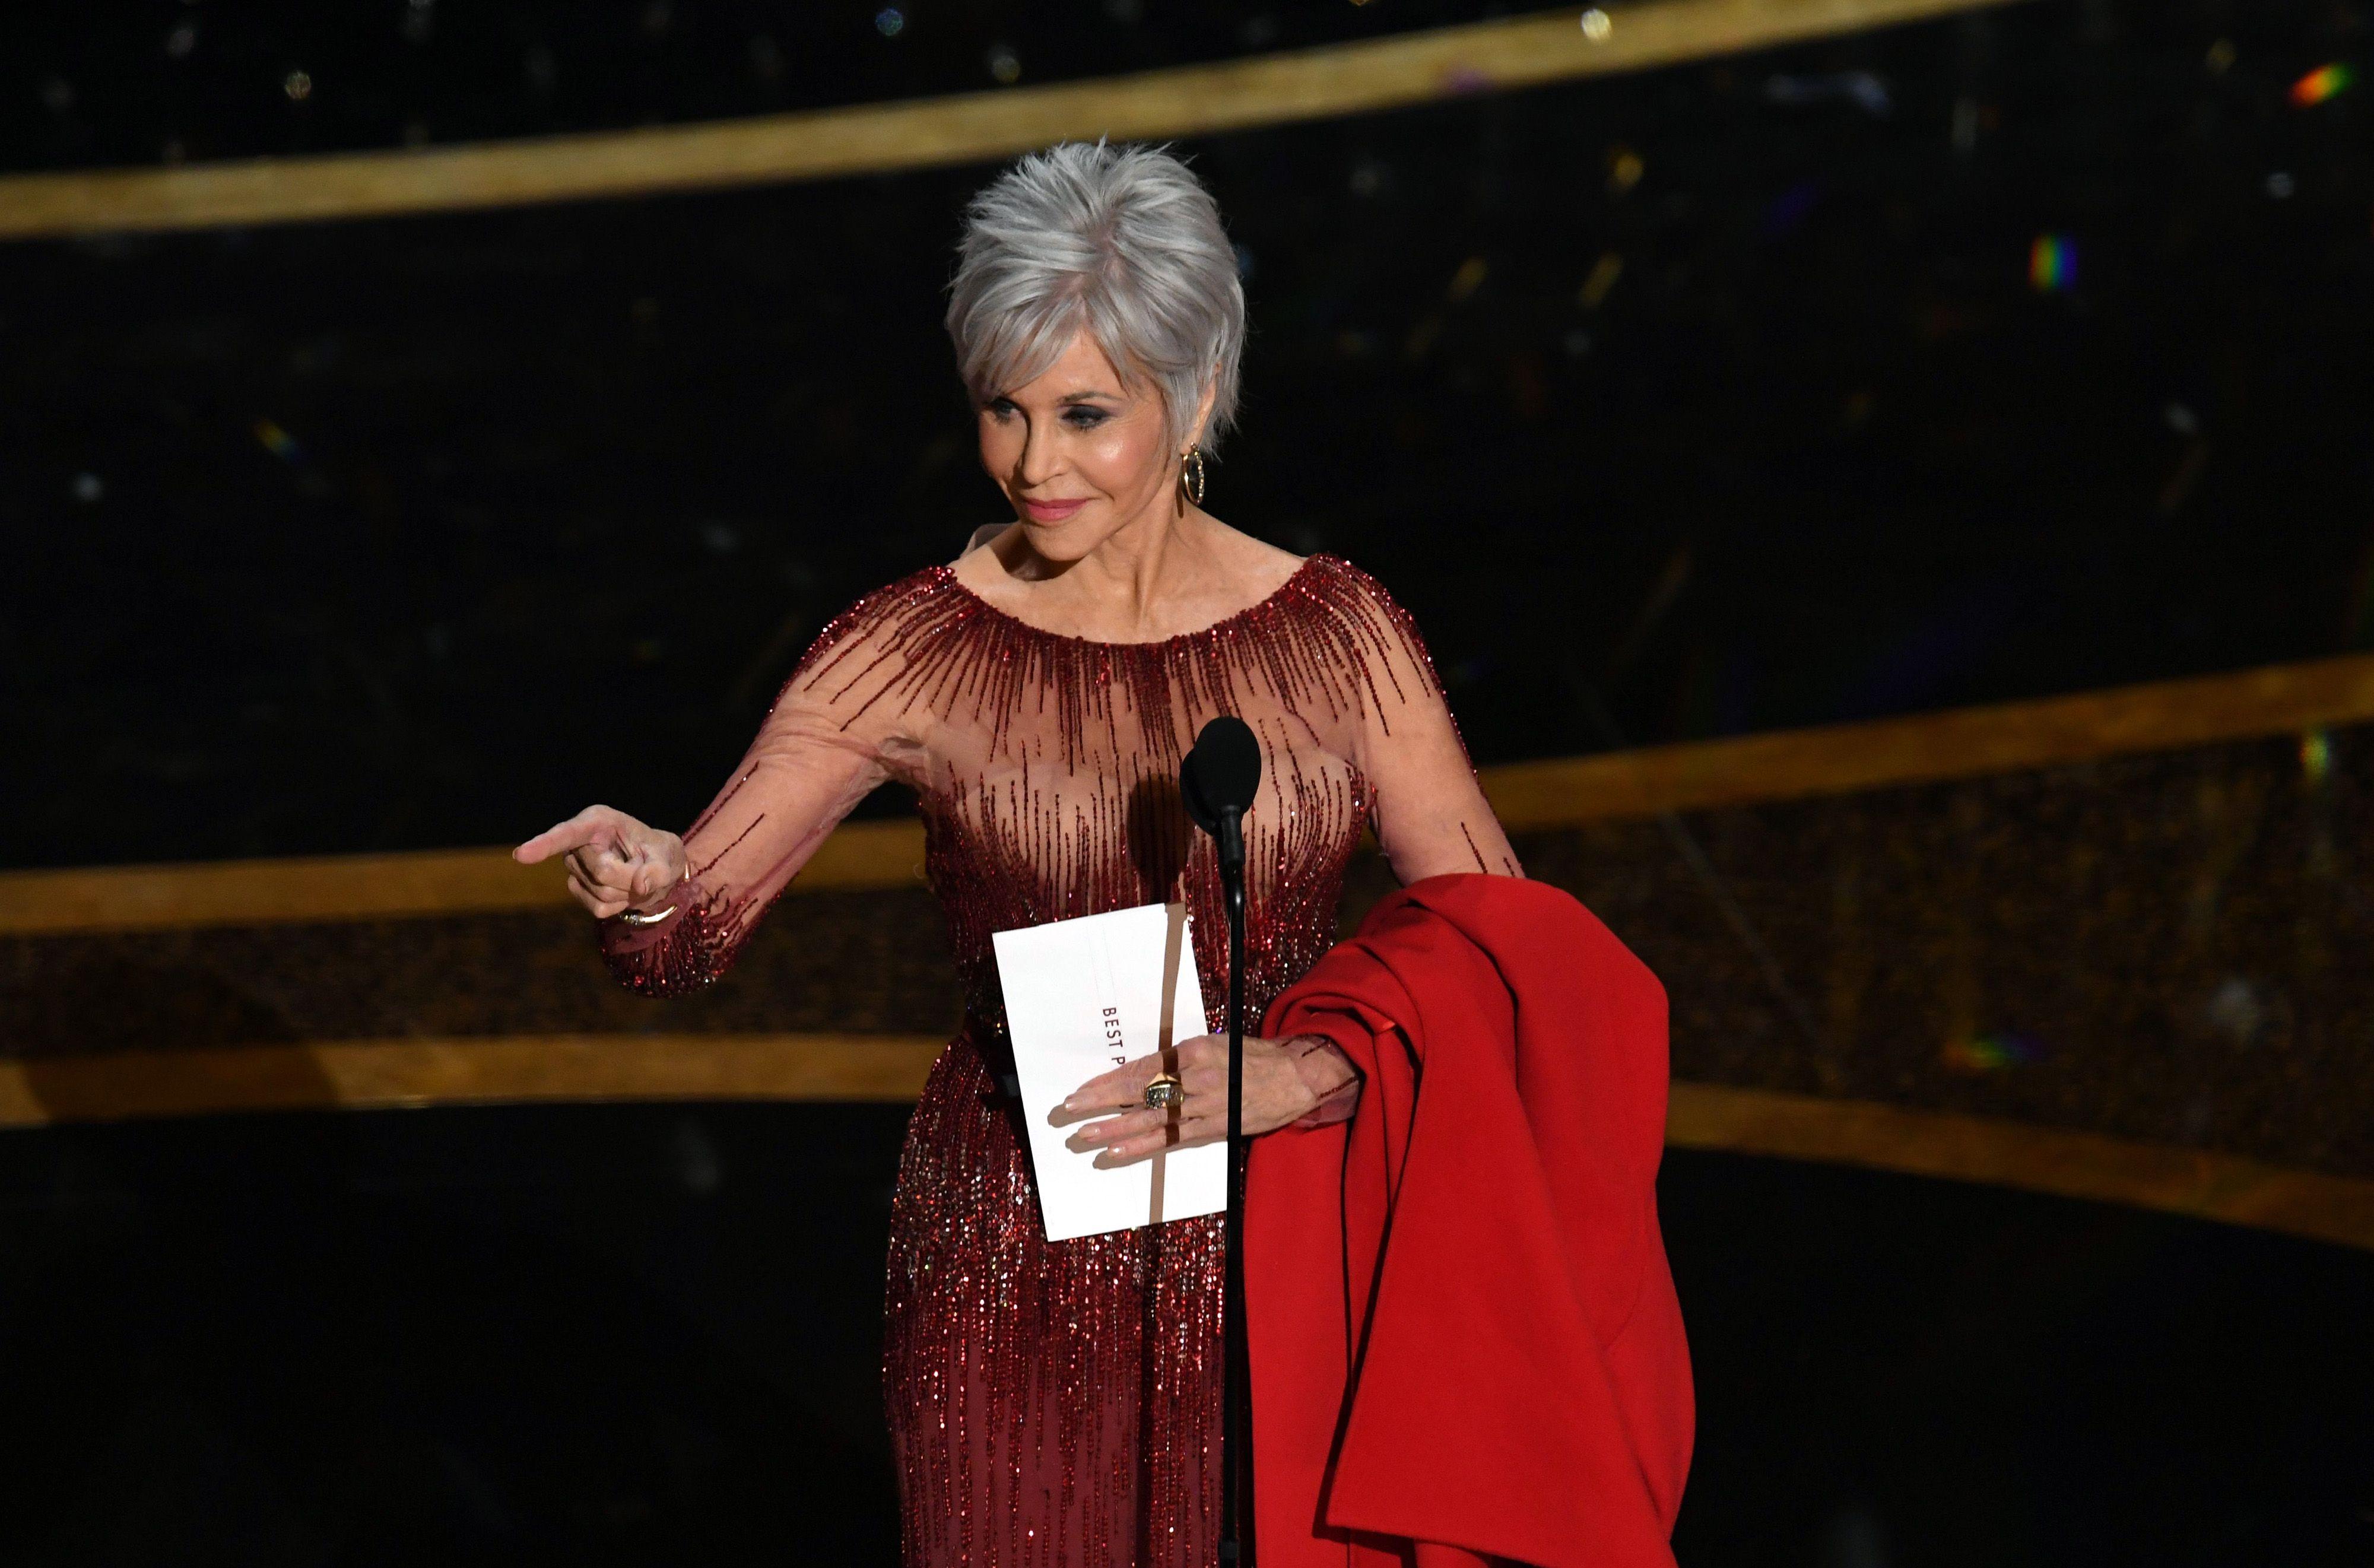 Jane Fonda at Academy Awards, pointing